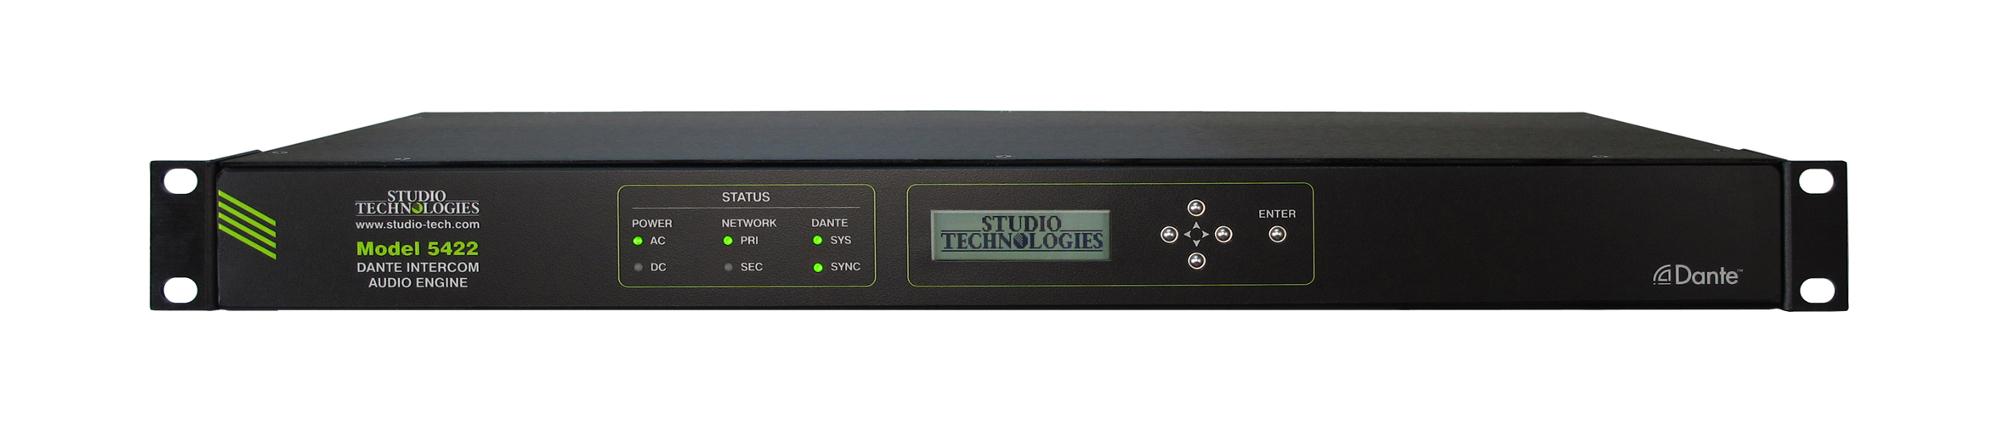 Dante Intercom Audio Engine (Single 32 Output Channel Group)